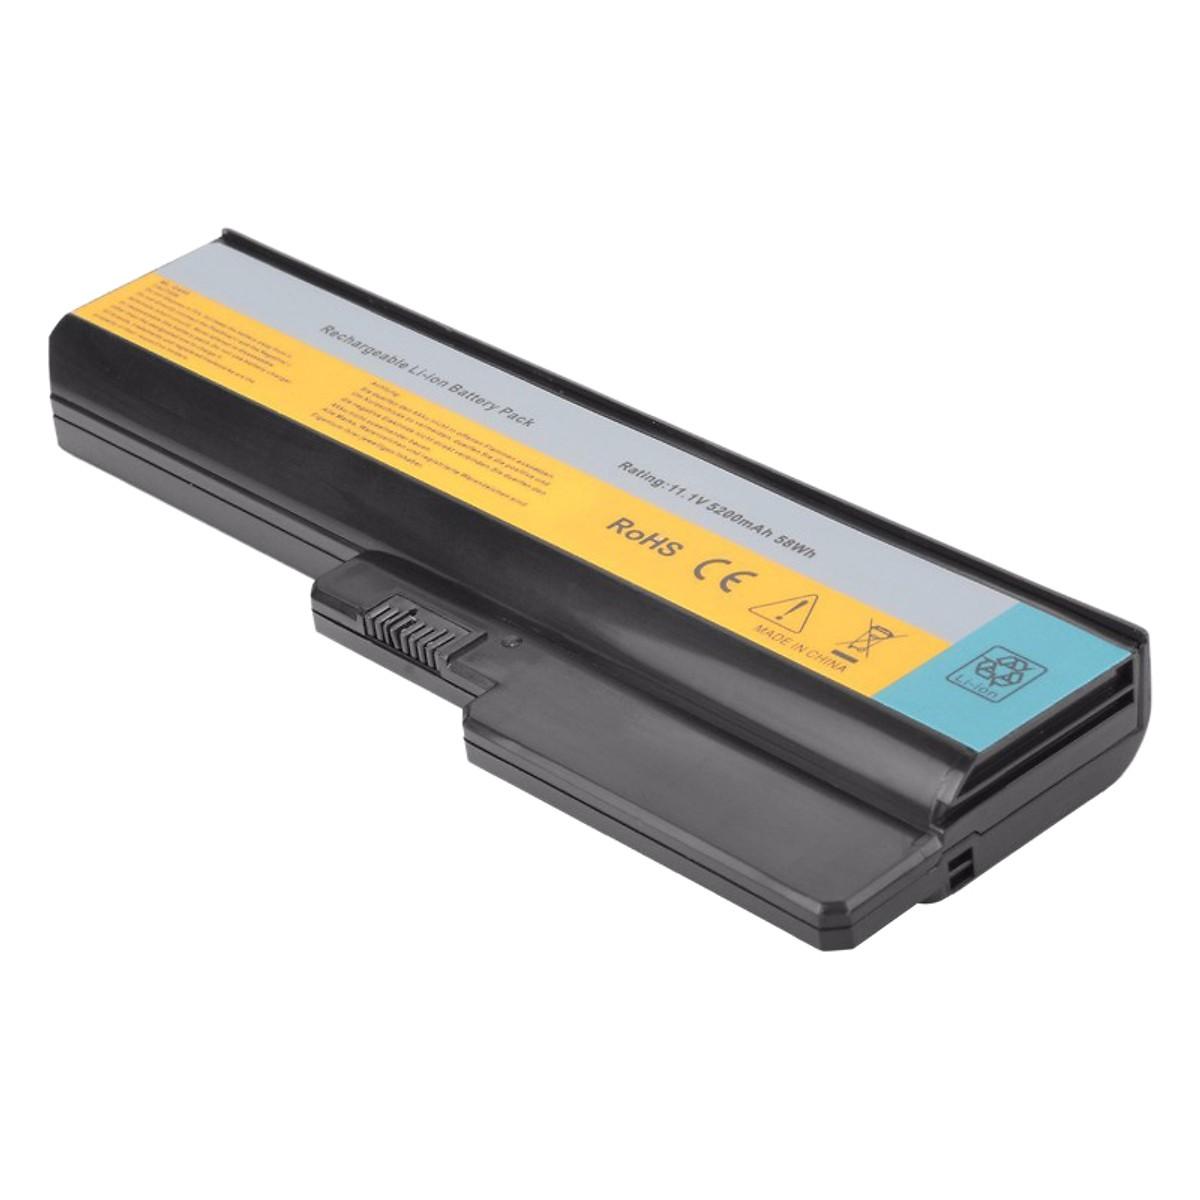 Pin Dành Cho Laptop Lenovo G430, G450, B460, B550, V460, Z360, G360 G450A, G455, G530, G530A, G550, G555, N500, B460, B550, V460, Z360, G360 - 18607905 , 3691214501130 , 62_22100255 , 450000 , Pin-Danh-Cho-Laptop-Lenovo-G430-G450-B460-B550-V460-Z360-G360-G450A-G455-G530-G530A-G550-G555-N500-B460-B550-V460-Z360-G360-62_22100255 , tiki.vn , Pin Dành Cho Laptop Lenovo G430, G450, B460, B550, V